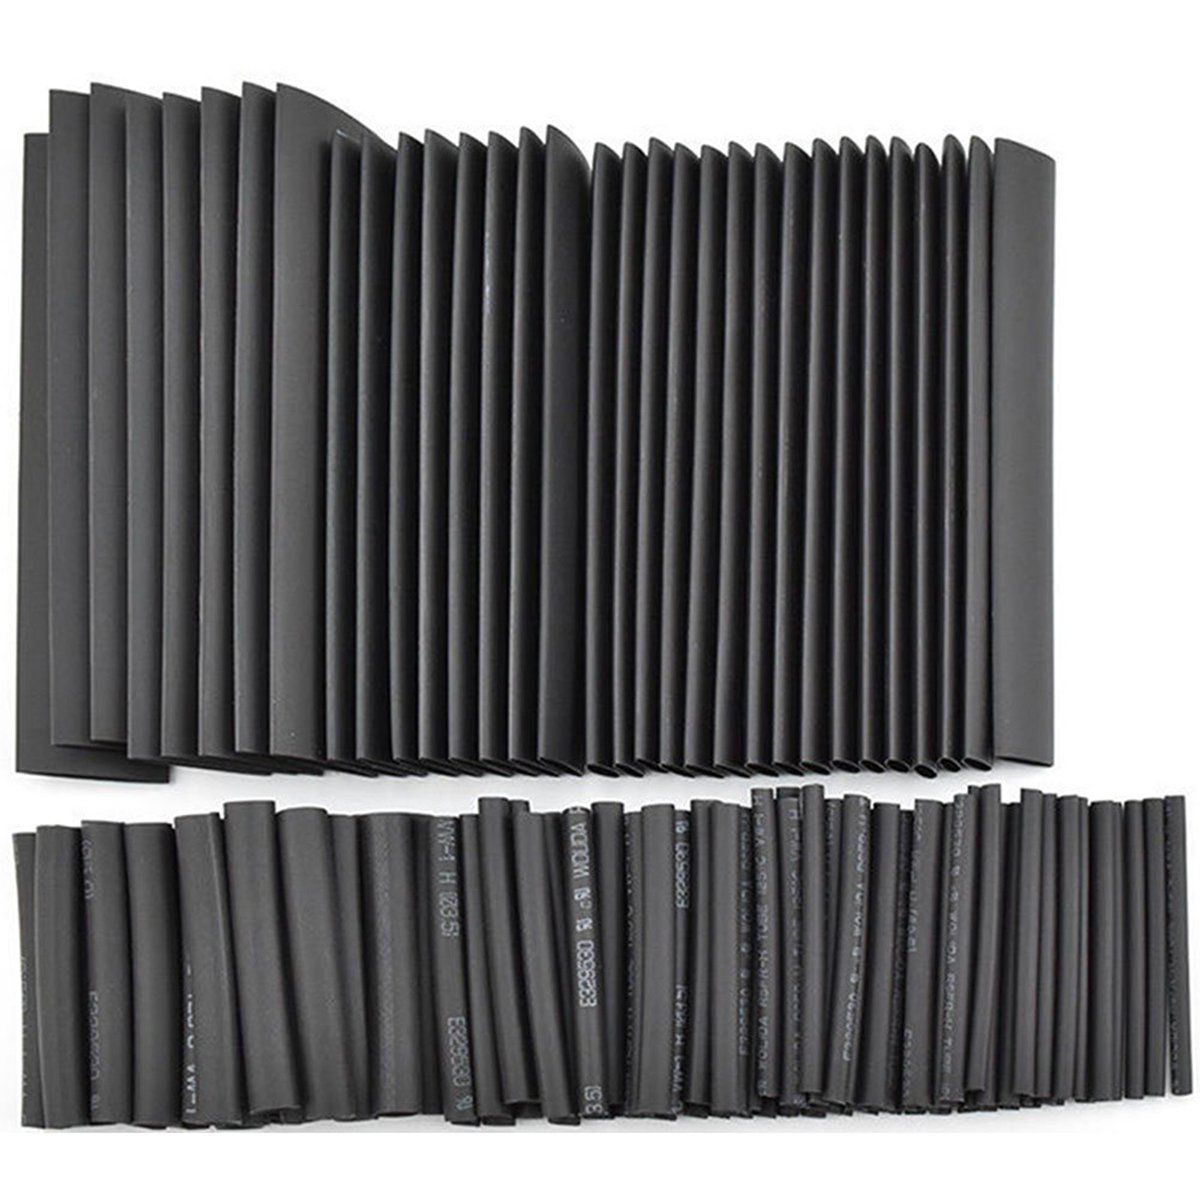 Hot New 127Pcs Black Glue Weatherproof Heat Shrink Sleeving Tubing Tube Assortment Kit